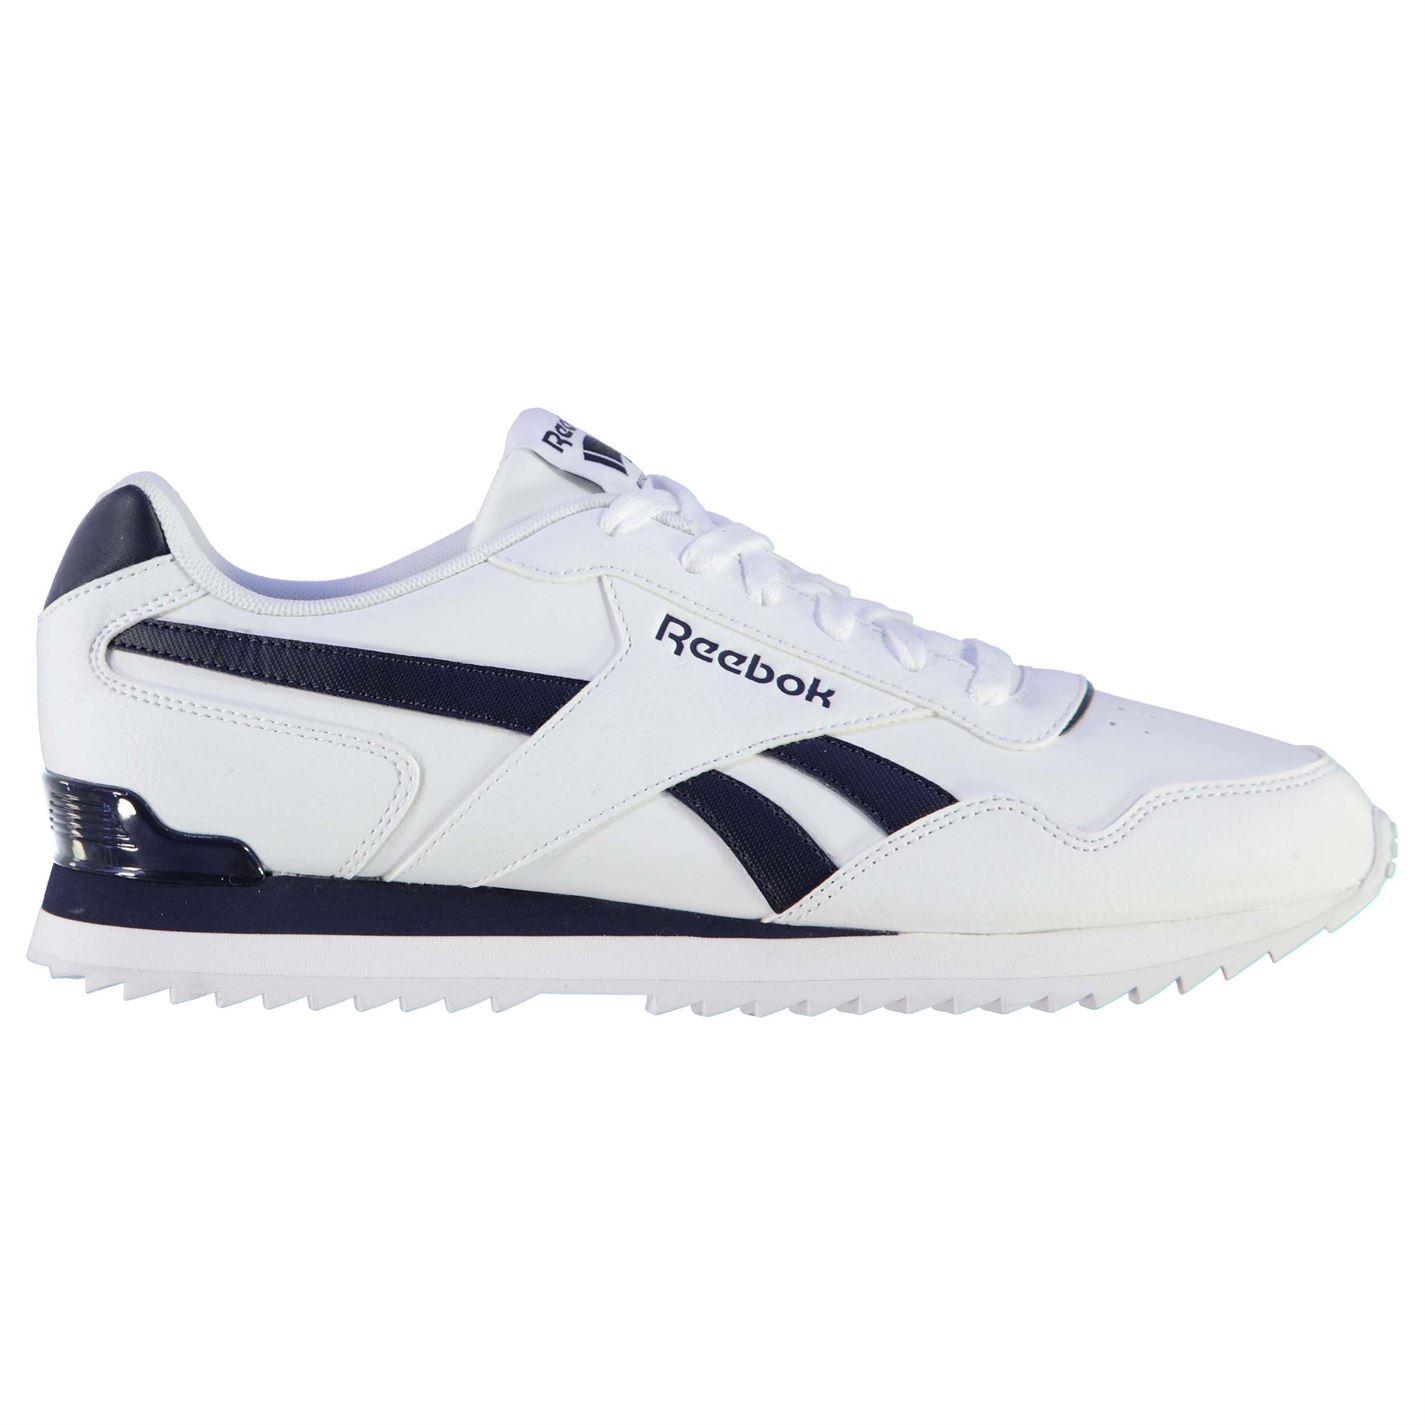 Reebok Glide Rip Clip Trainers Uomo White/Navy Sports Scarpe Scarpe da Ginnastica Footwear